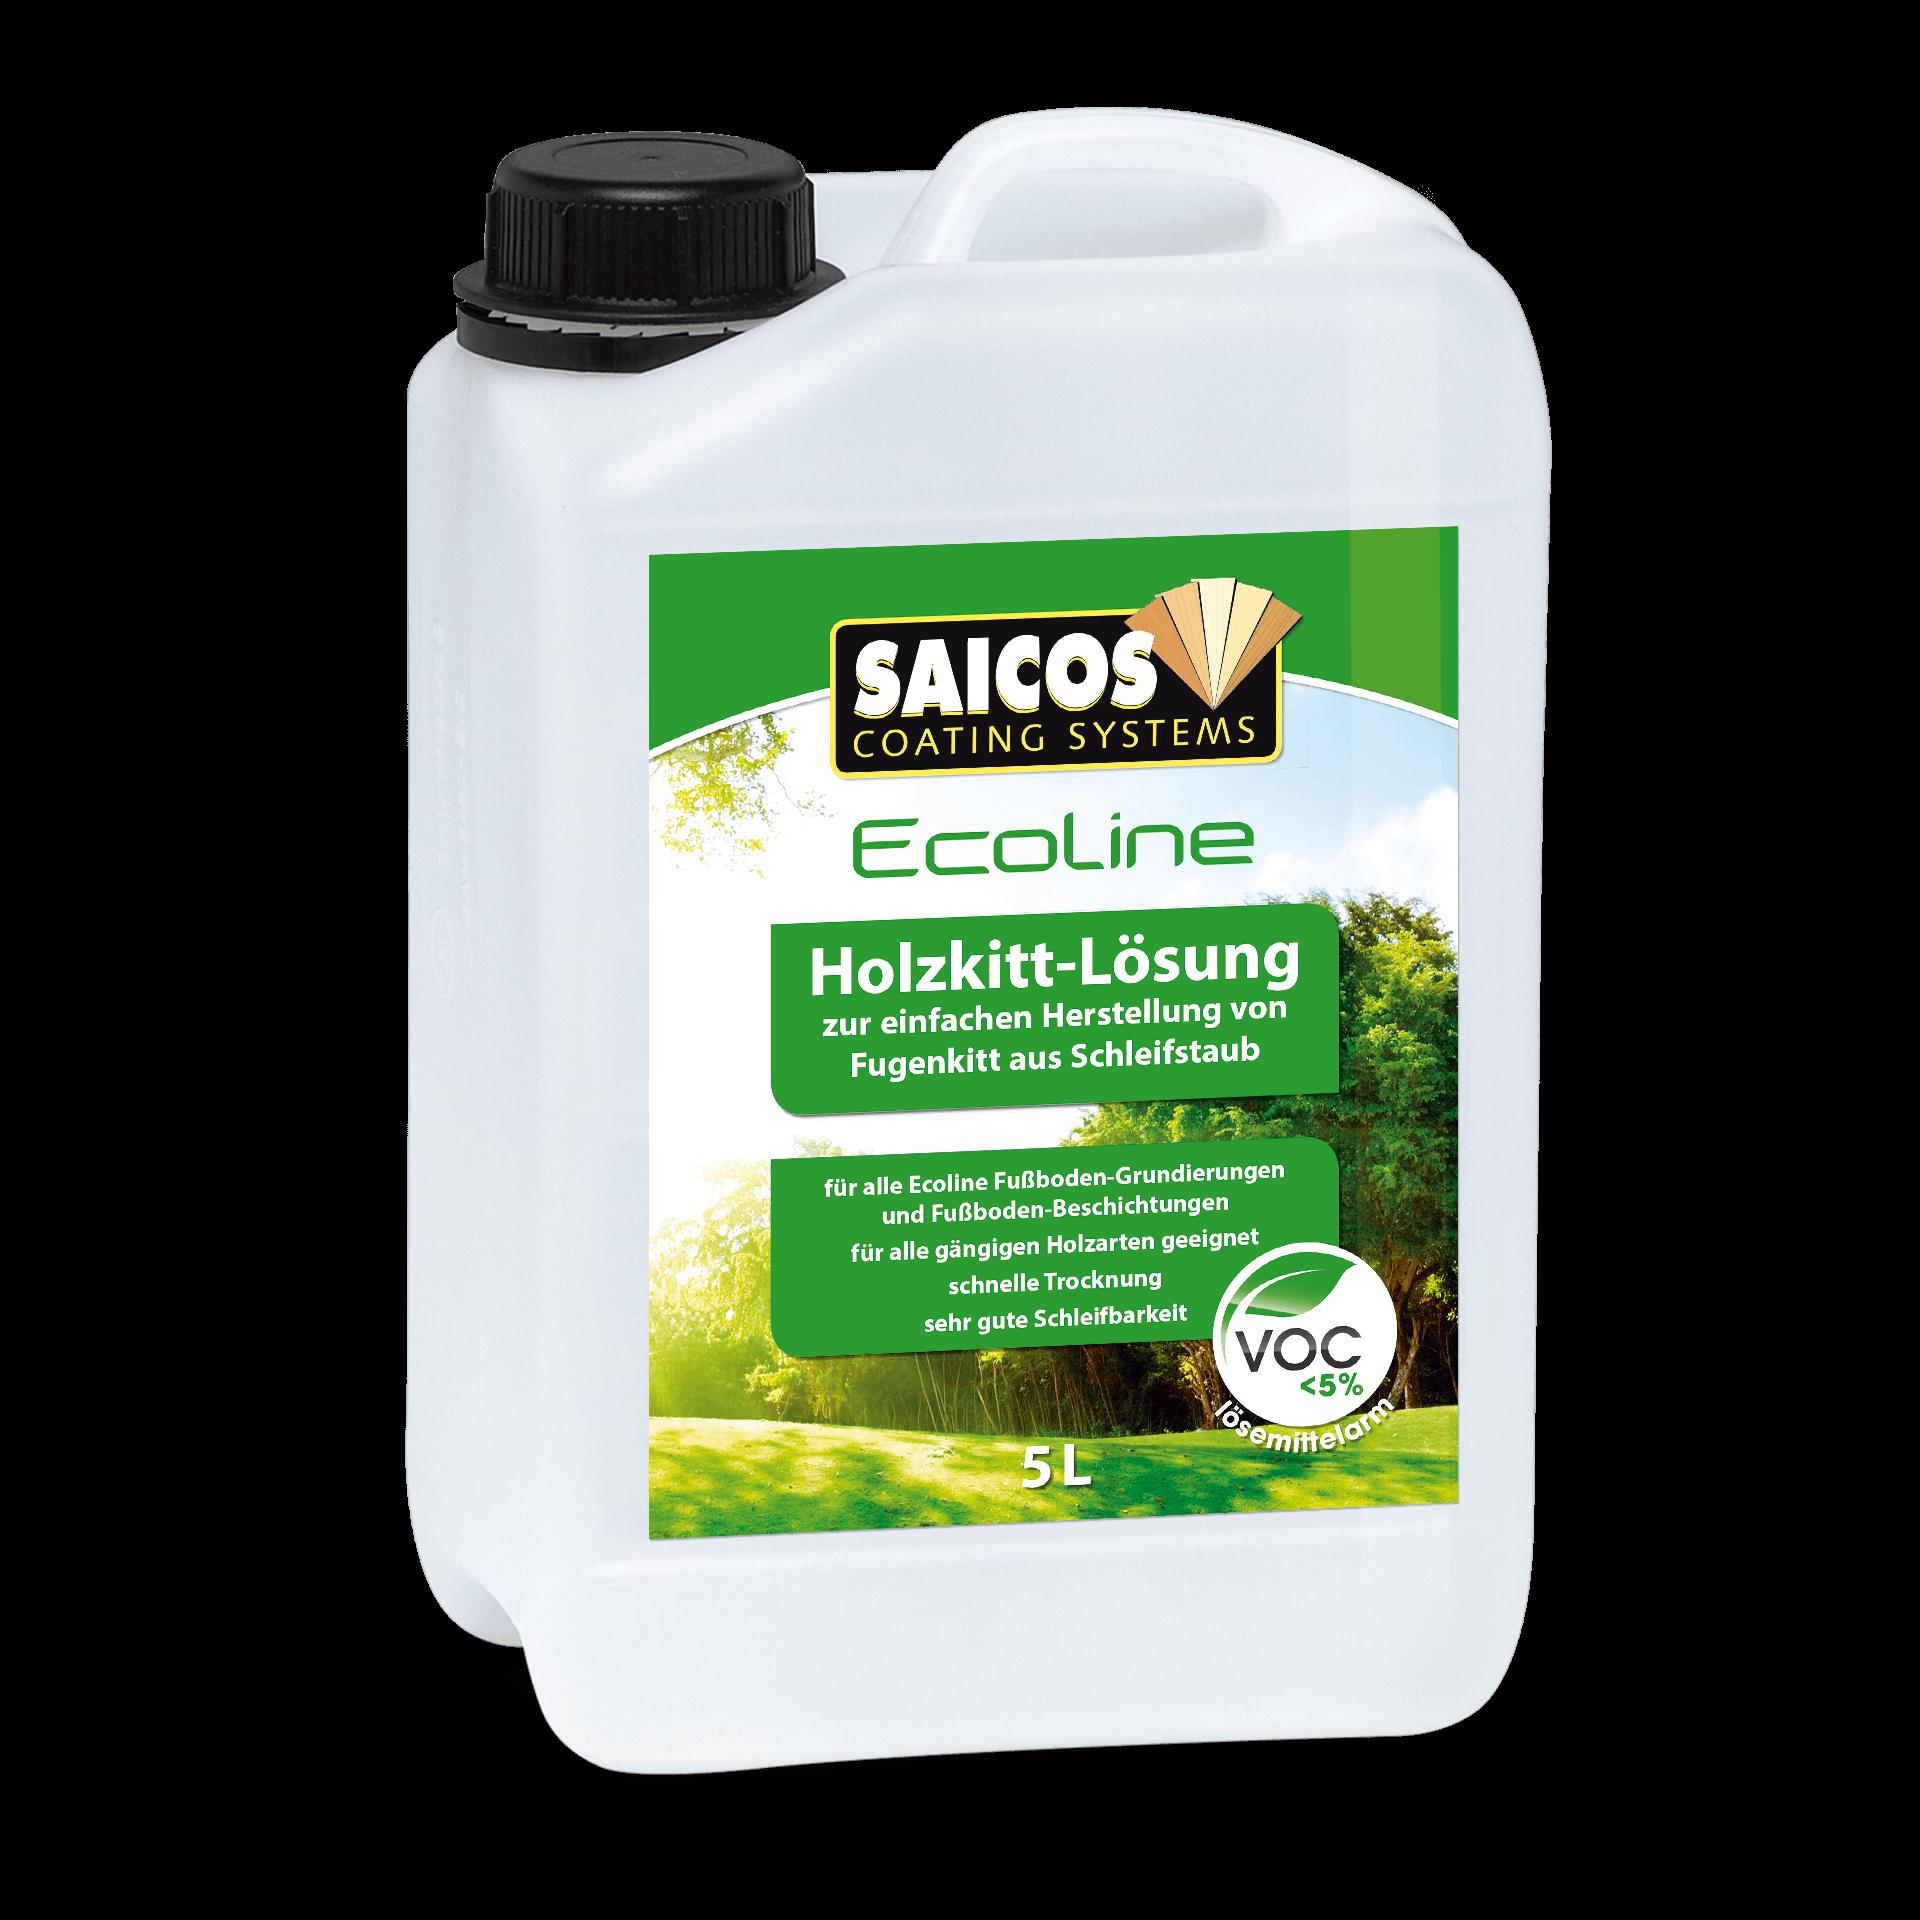 Saicos Ecoline Holzkitt-Lösung